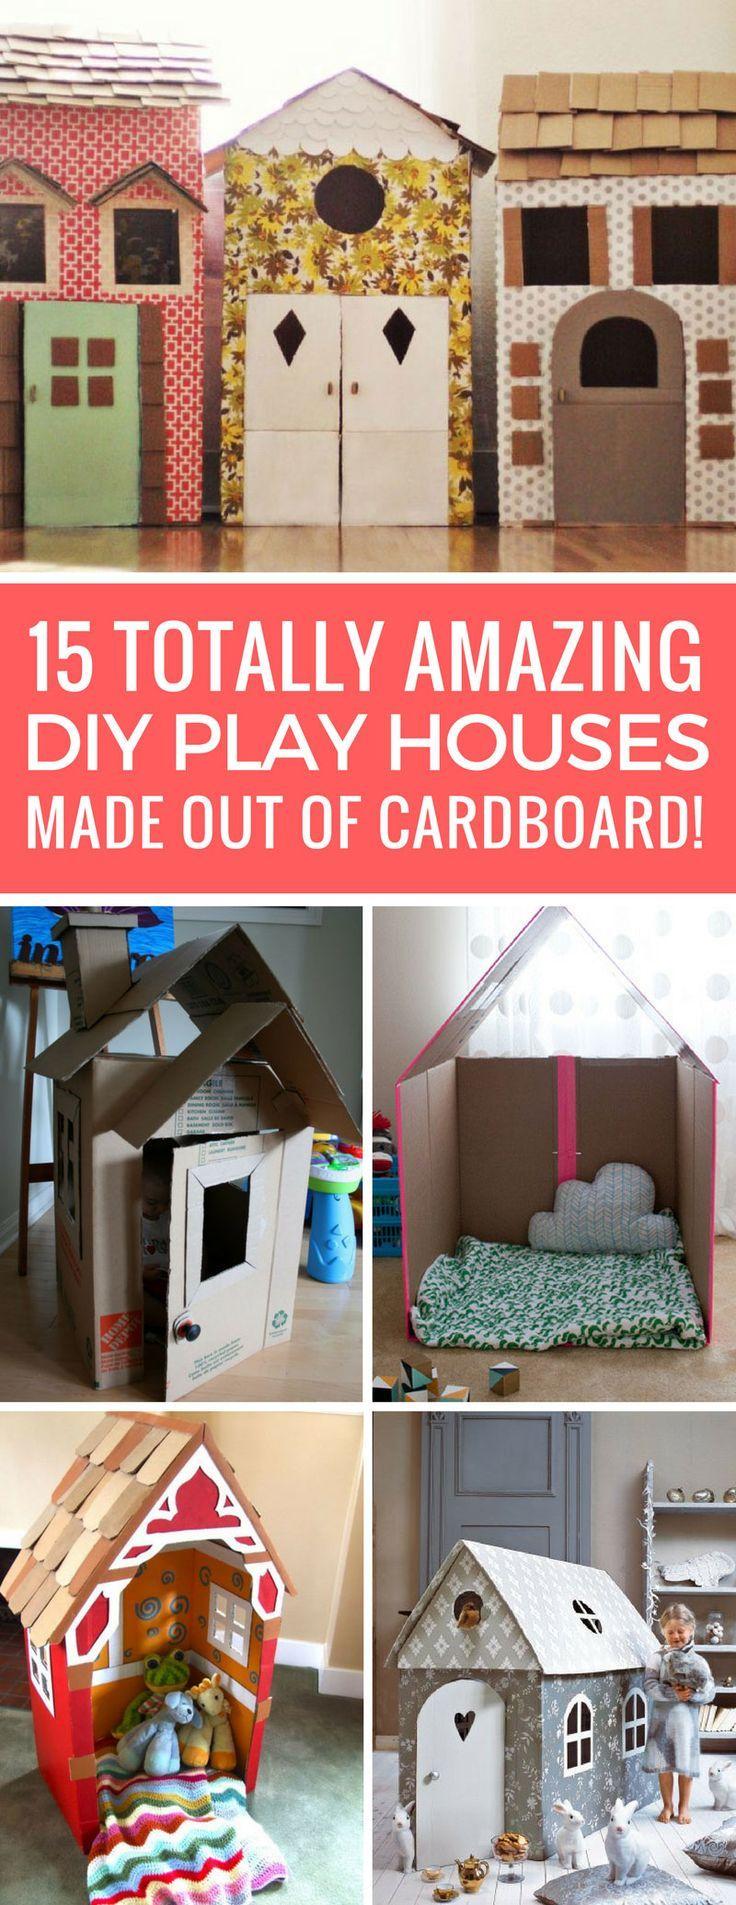 15 Amazing DIY Cardboard Playhouses Your Kids